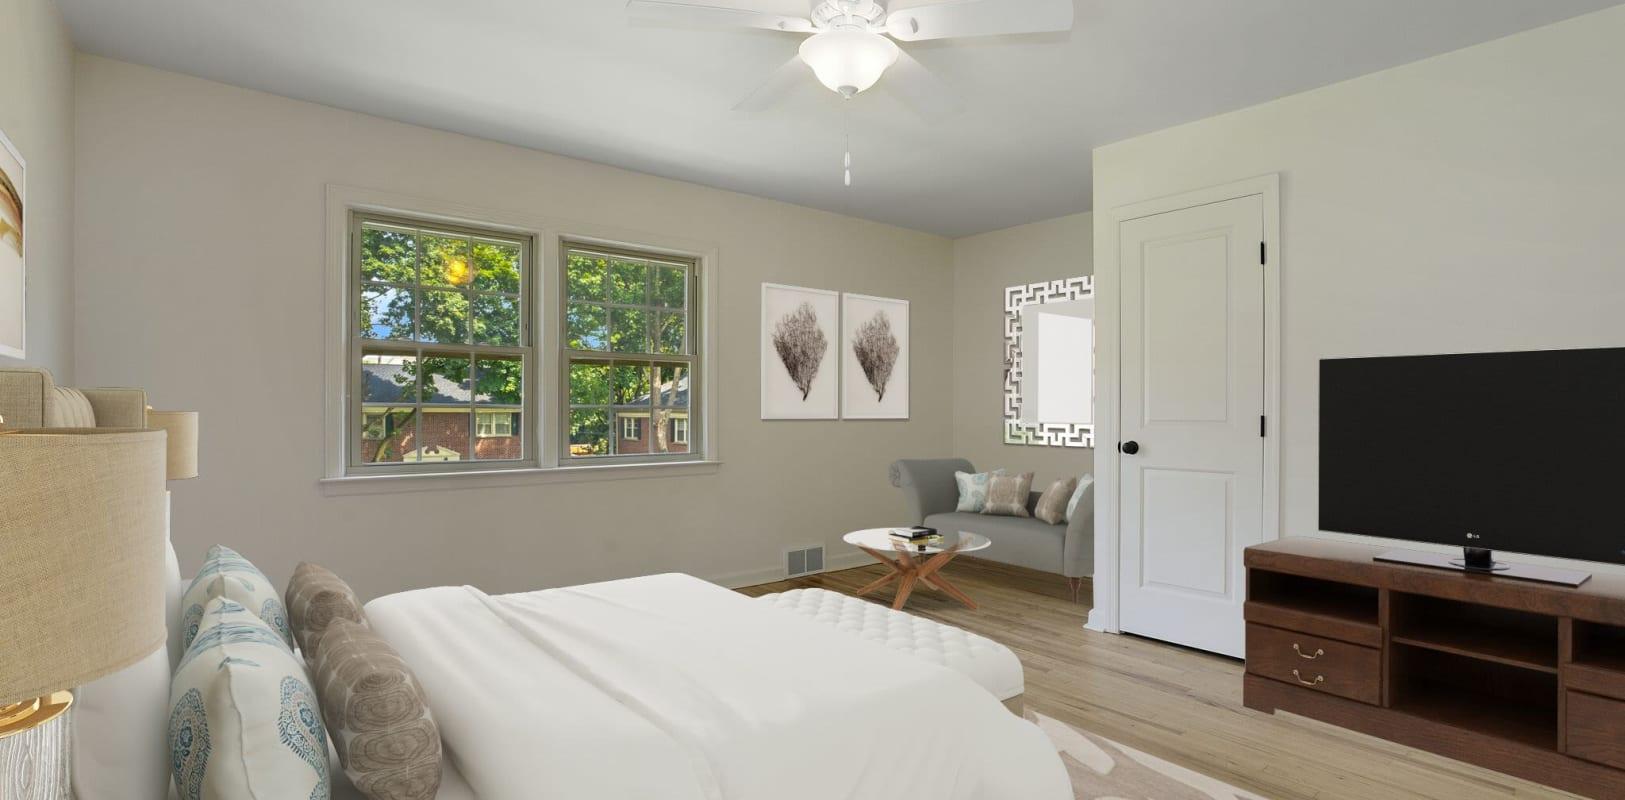 Bedroom at Northfield Townhouses in West Orange, New Jersey